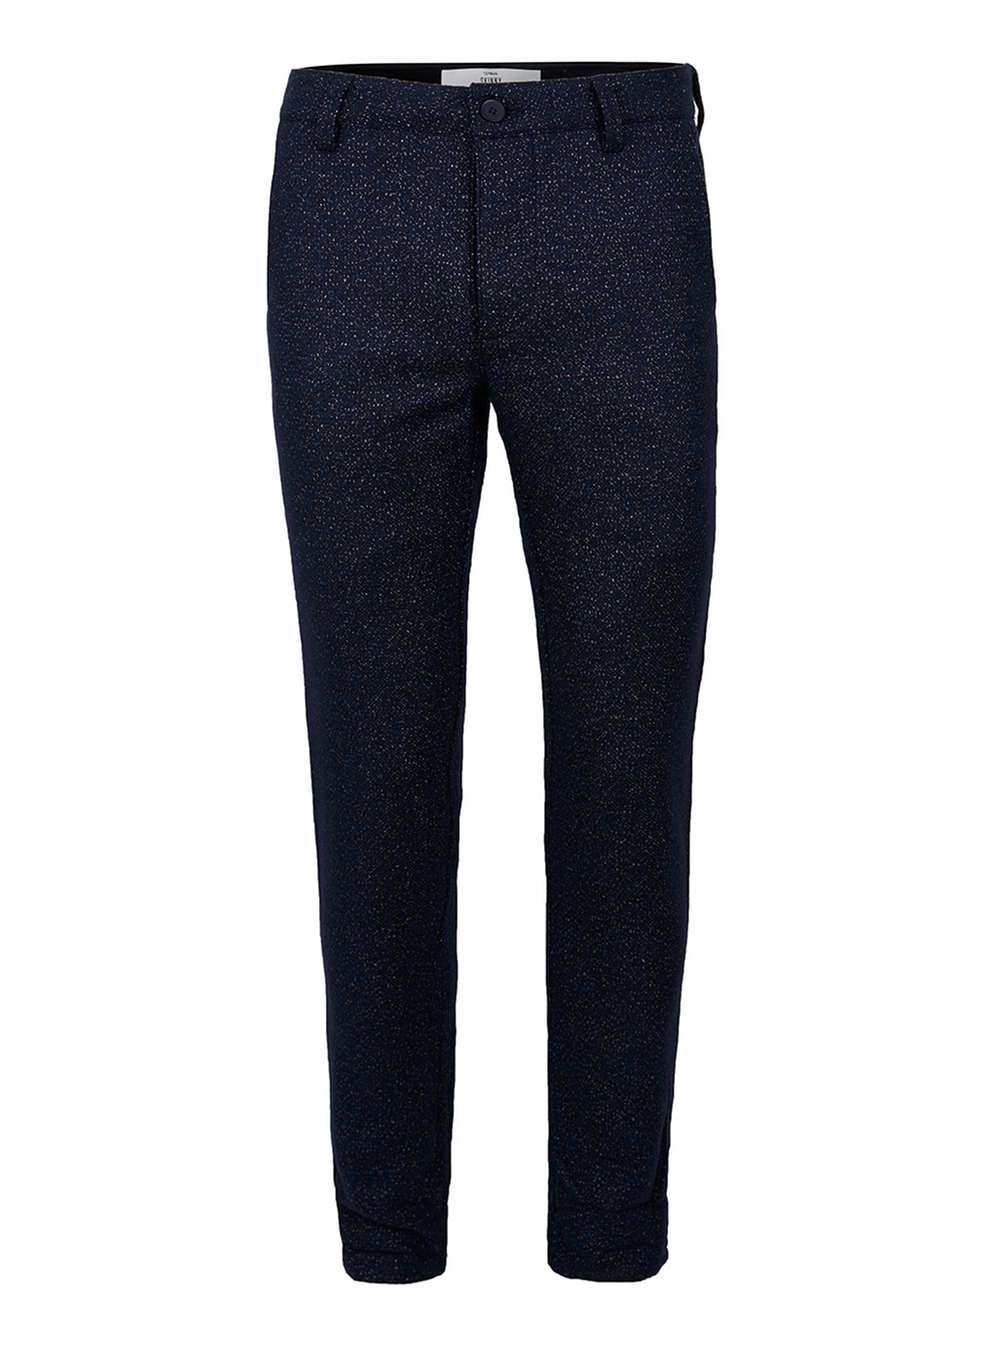 Wool blend skinny chinos, £35 (topman.com)